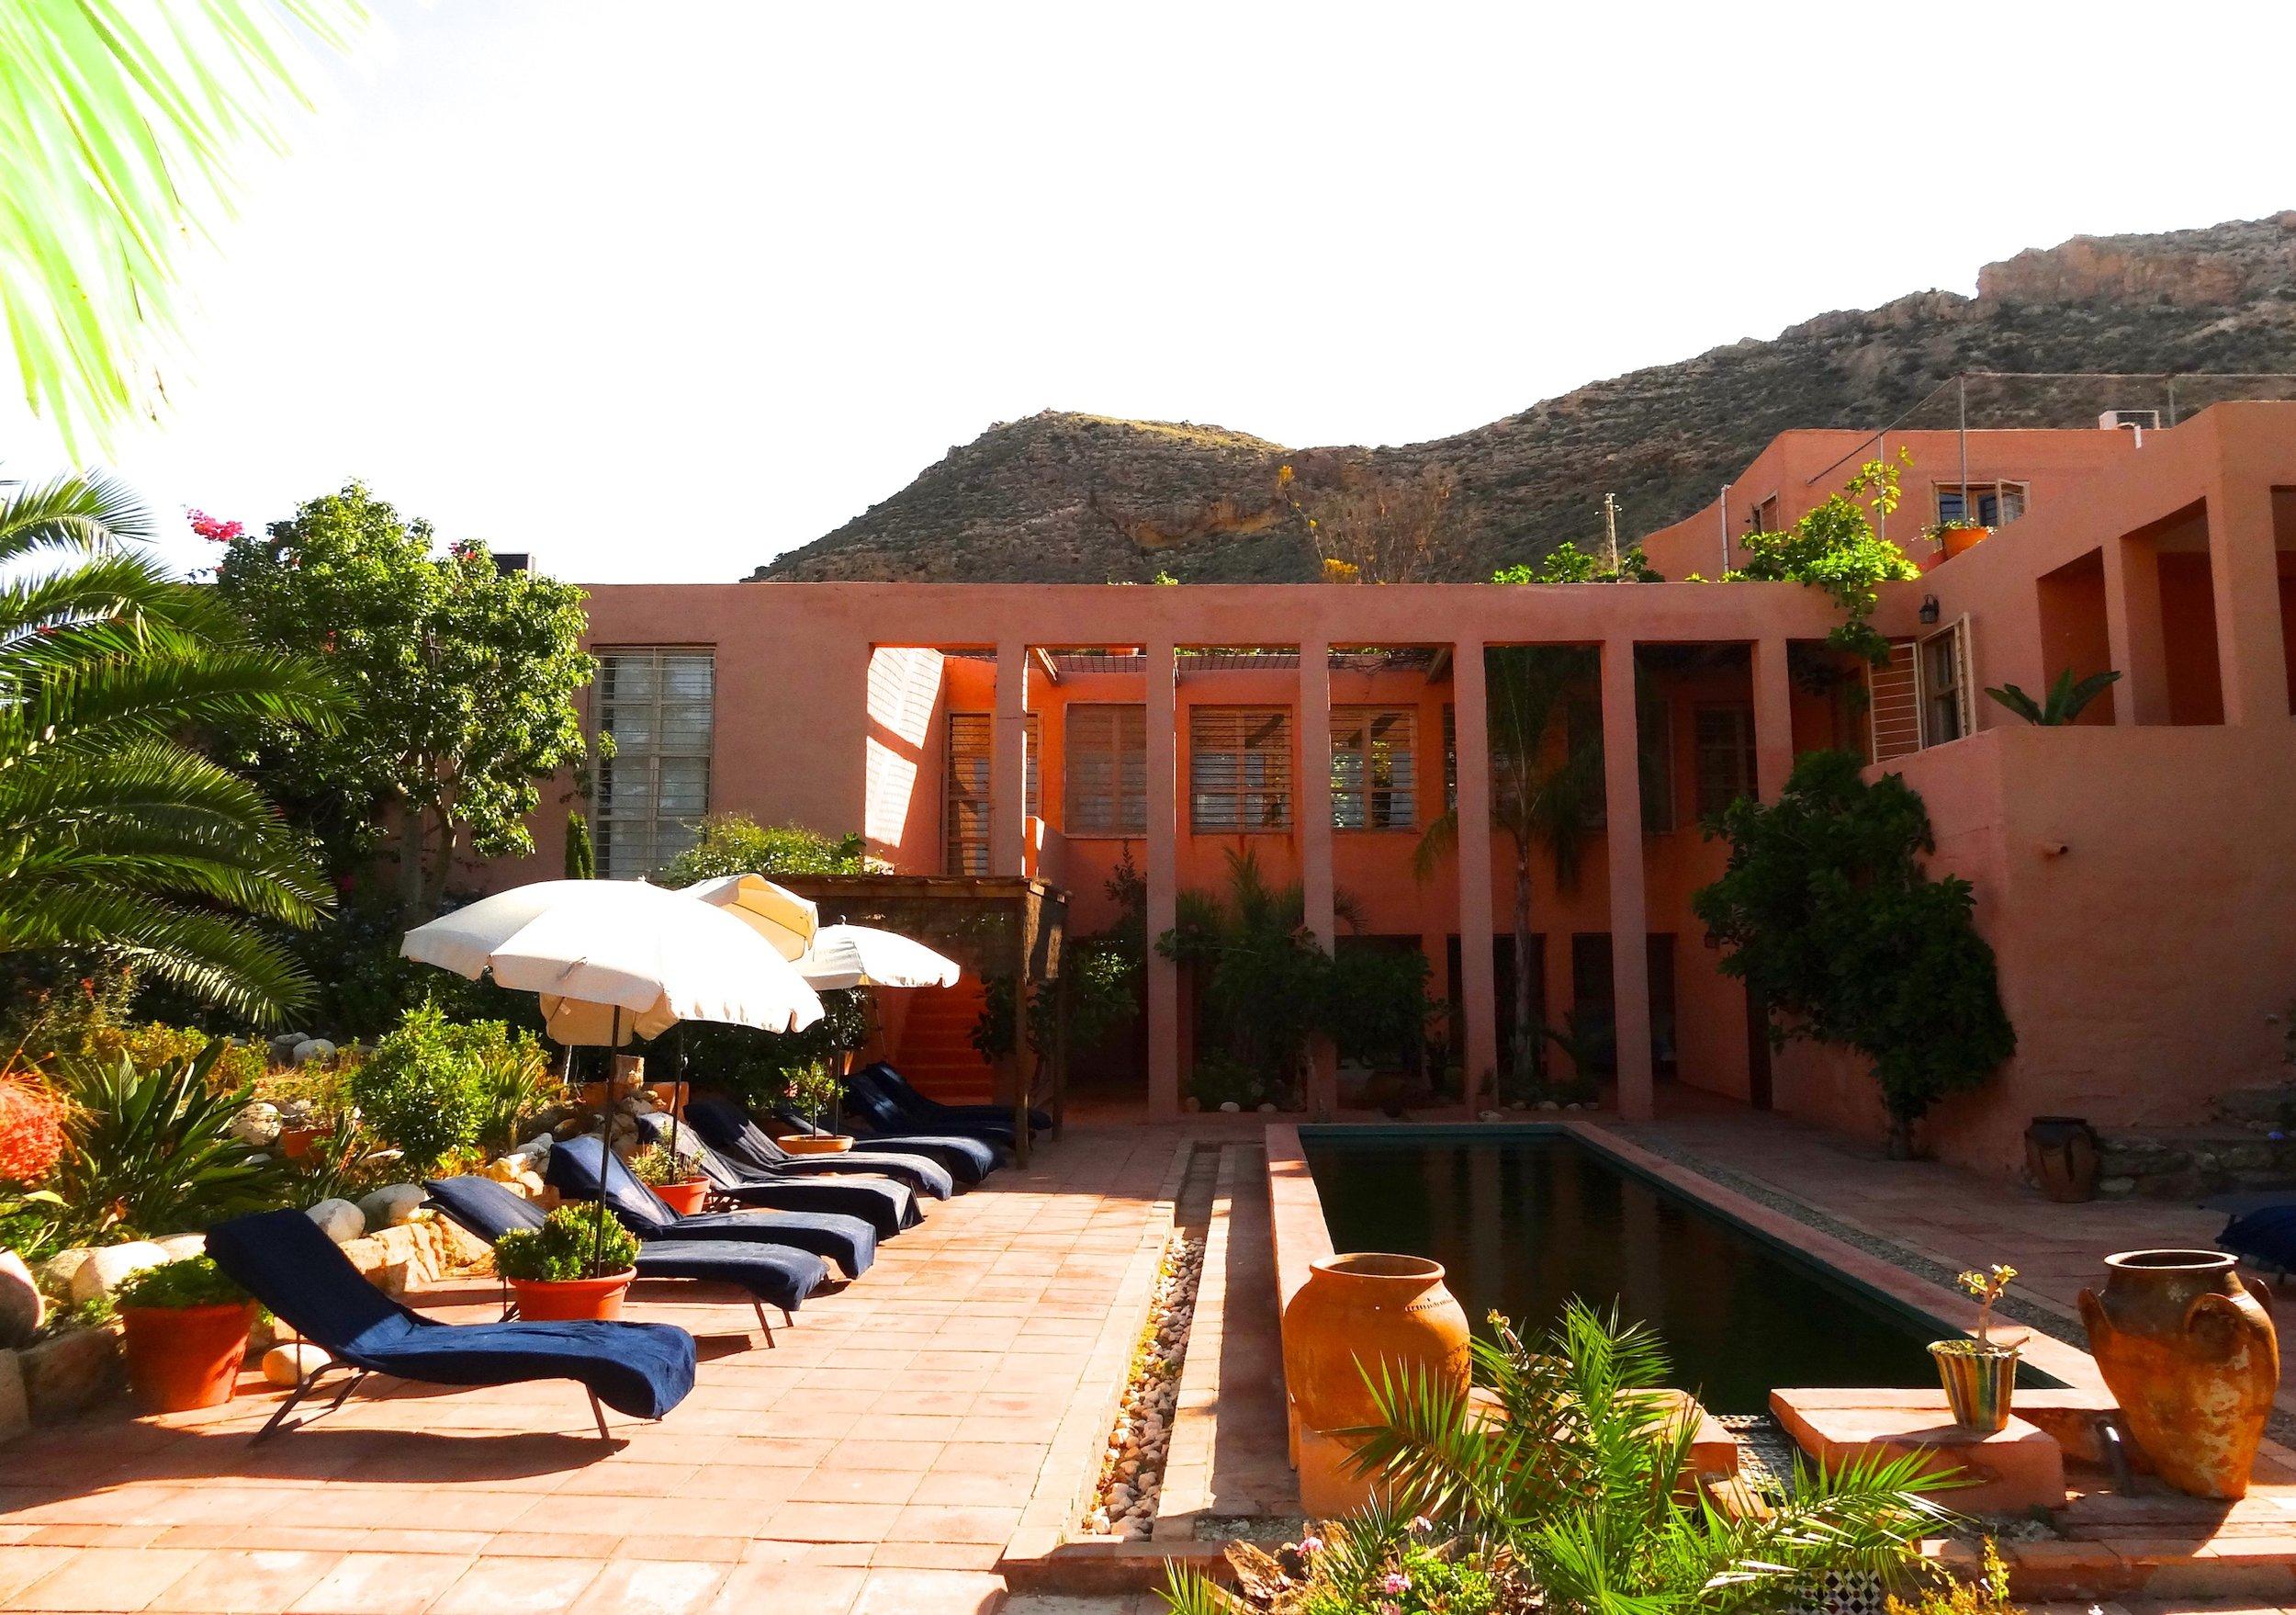 Loungers pool and main house rectangle.jpeg